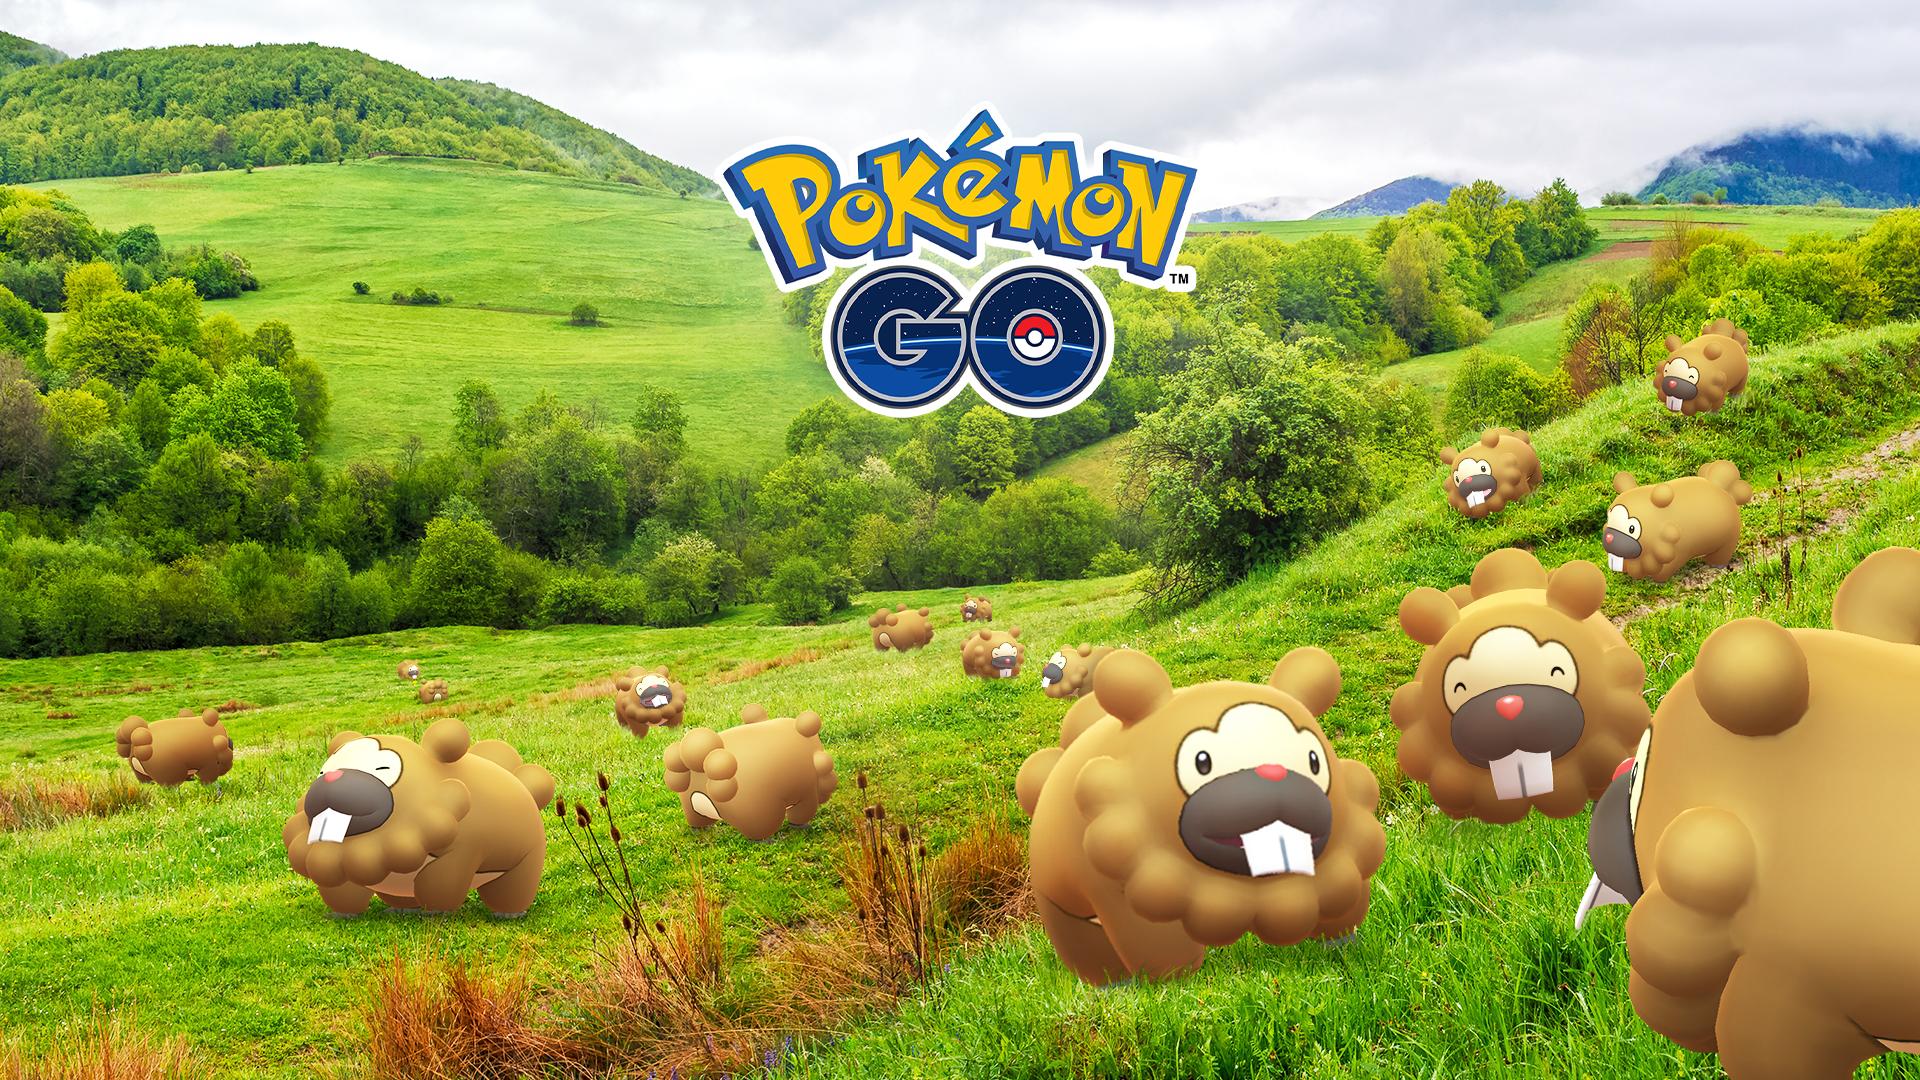 Pokémon GO: Start of the big Bidiza day is pending - information on activation & bonuses